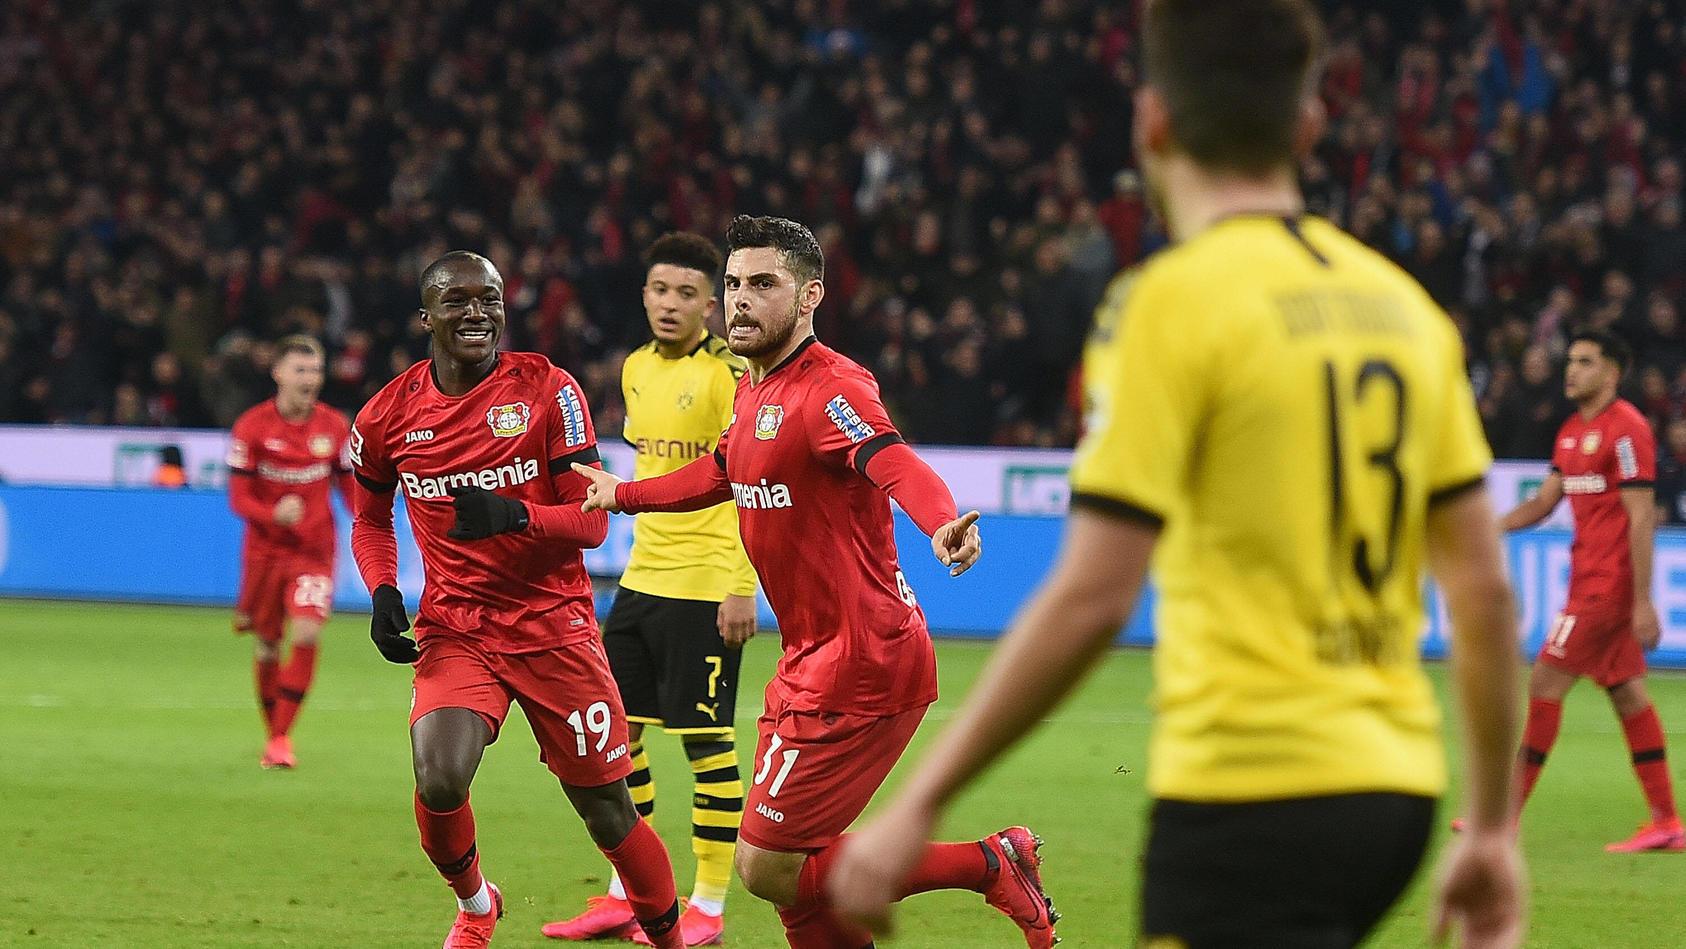 08.02.2020, xhbx, Fussball 1.Bundesliga, Bayer 04 Leverkusen - Borussia Dortmund emspor, v.l. Torjubel, Goal celebratio